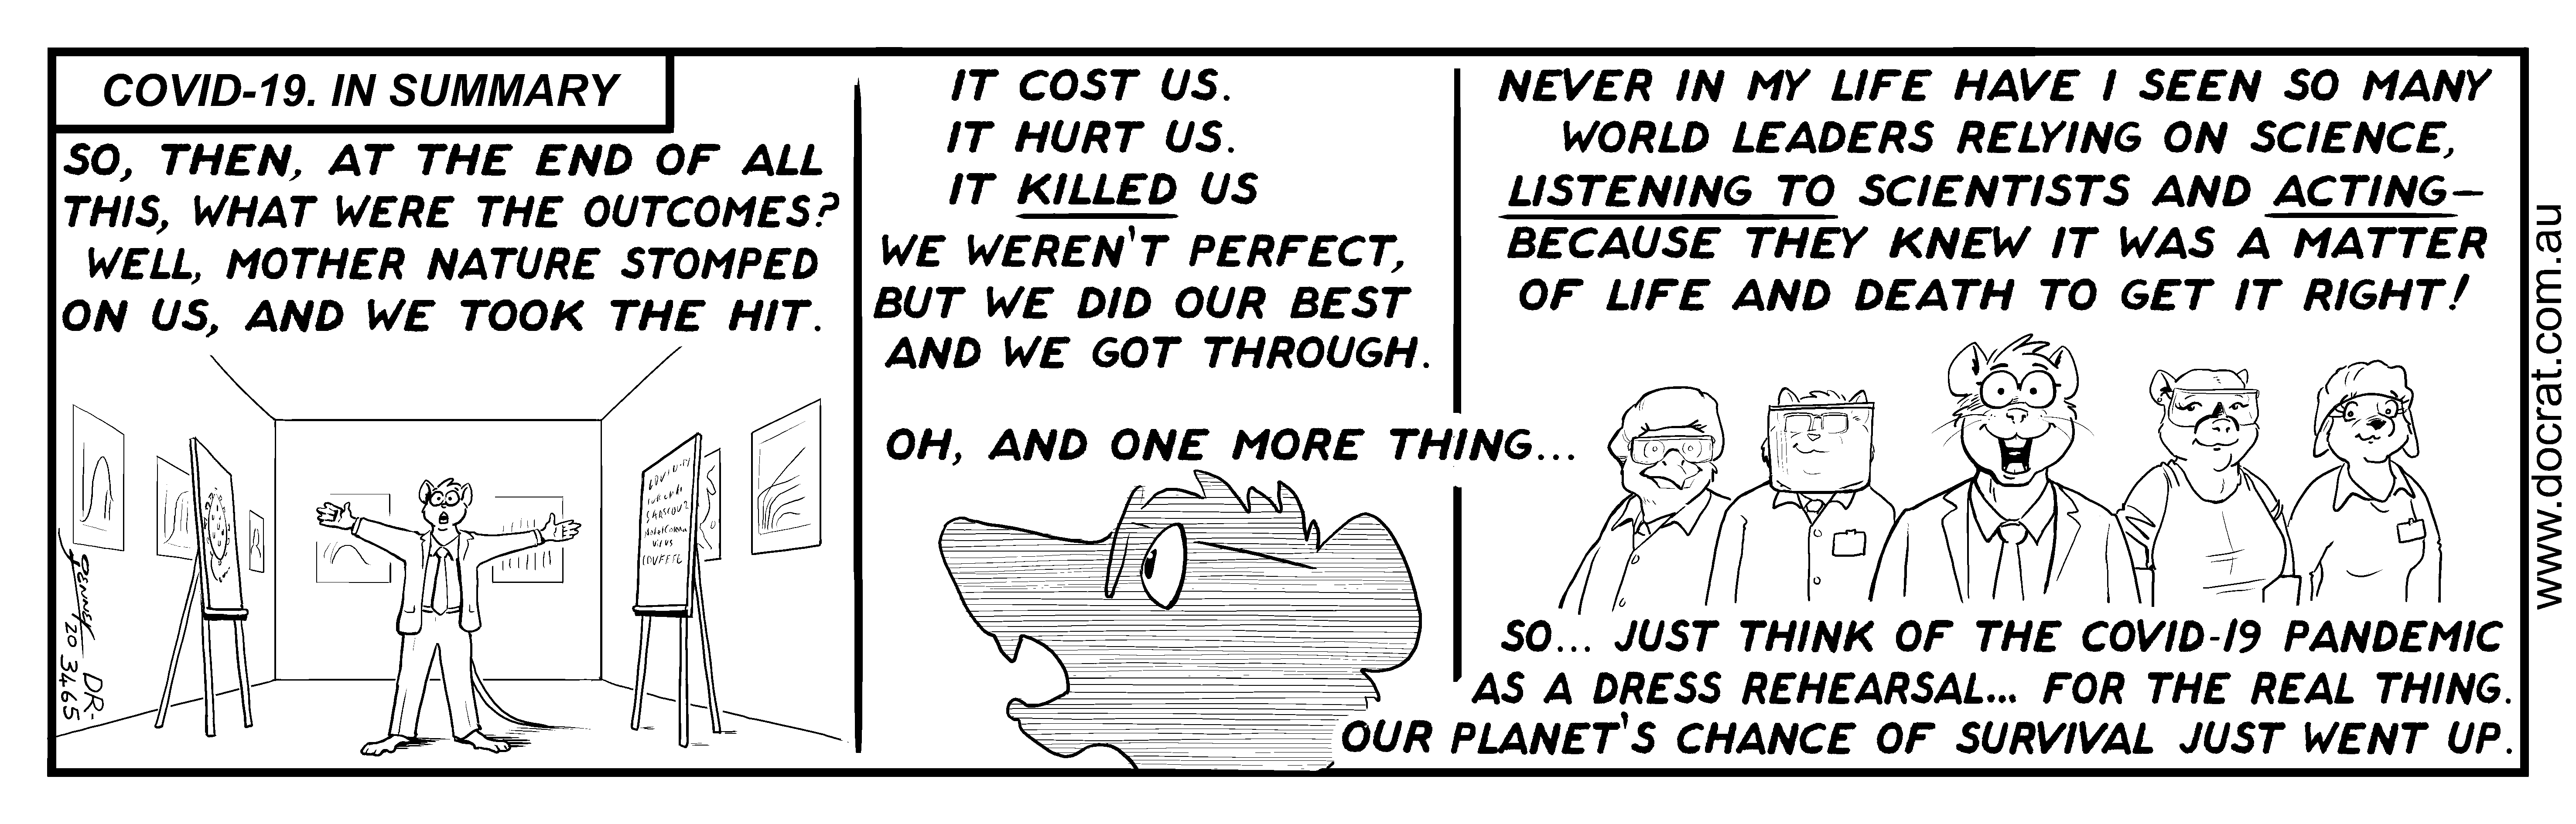 20200424